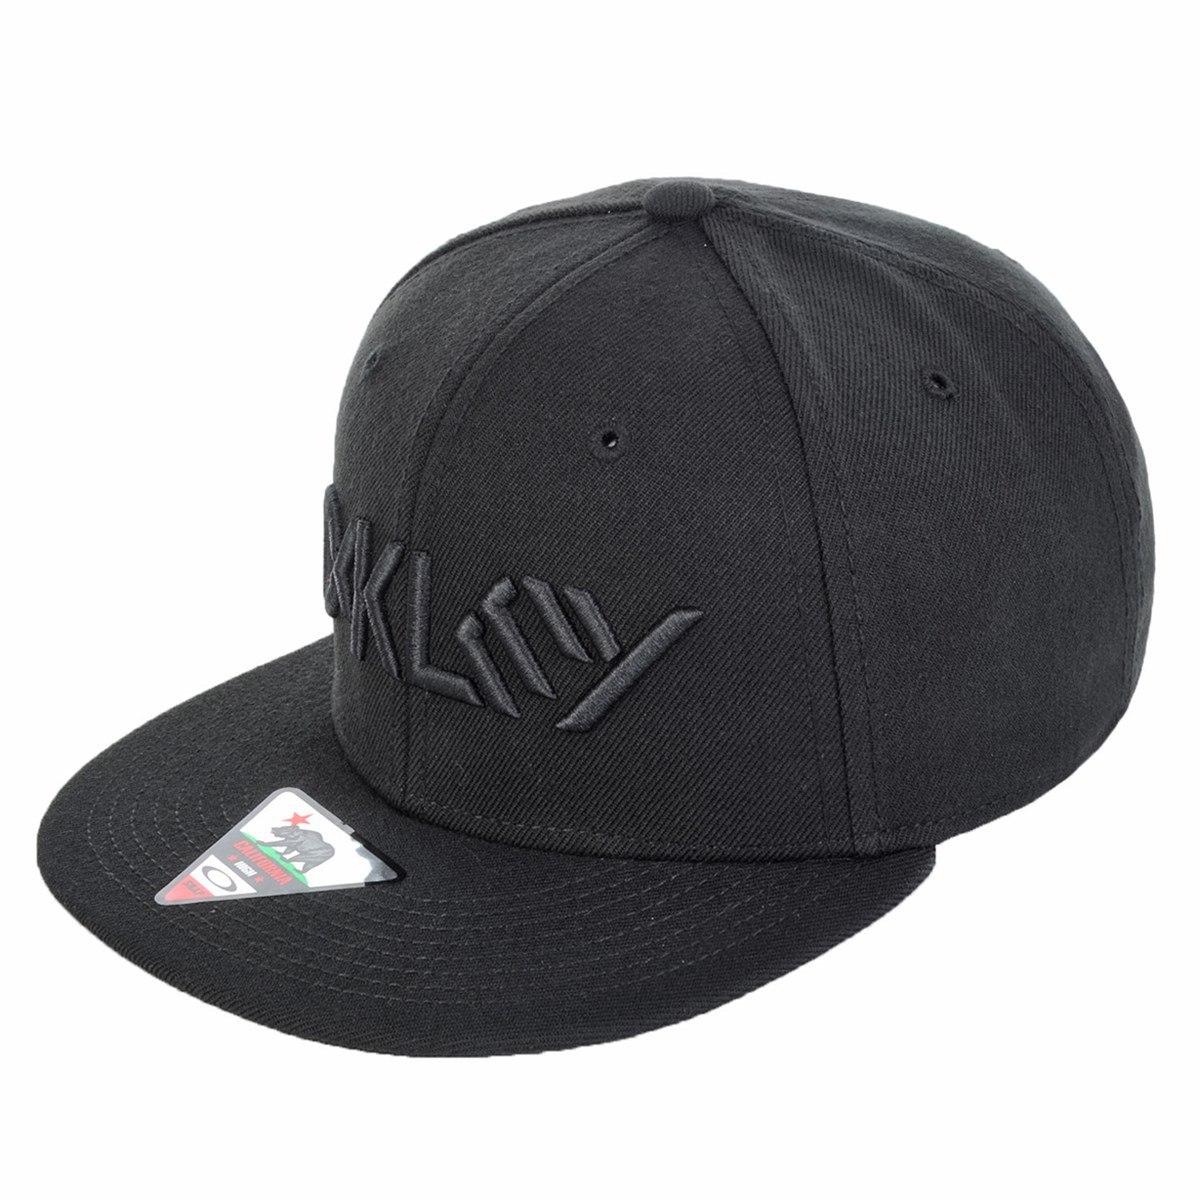 8544cb91f ... coupon boné masculino oakley octane hat preto. carregando zoom. fb78b  60759